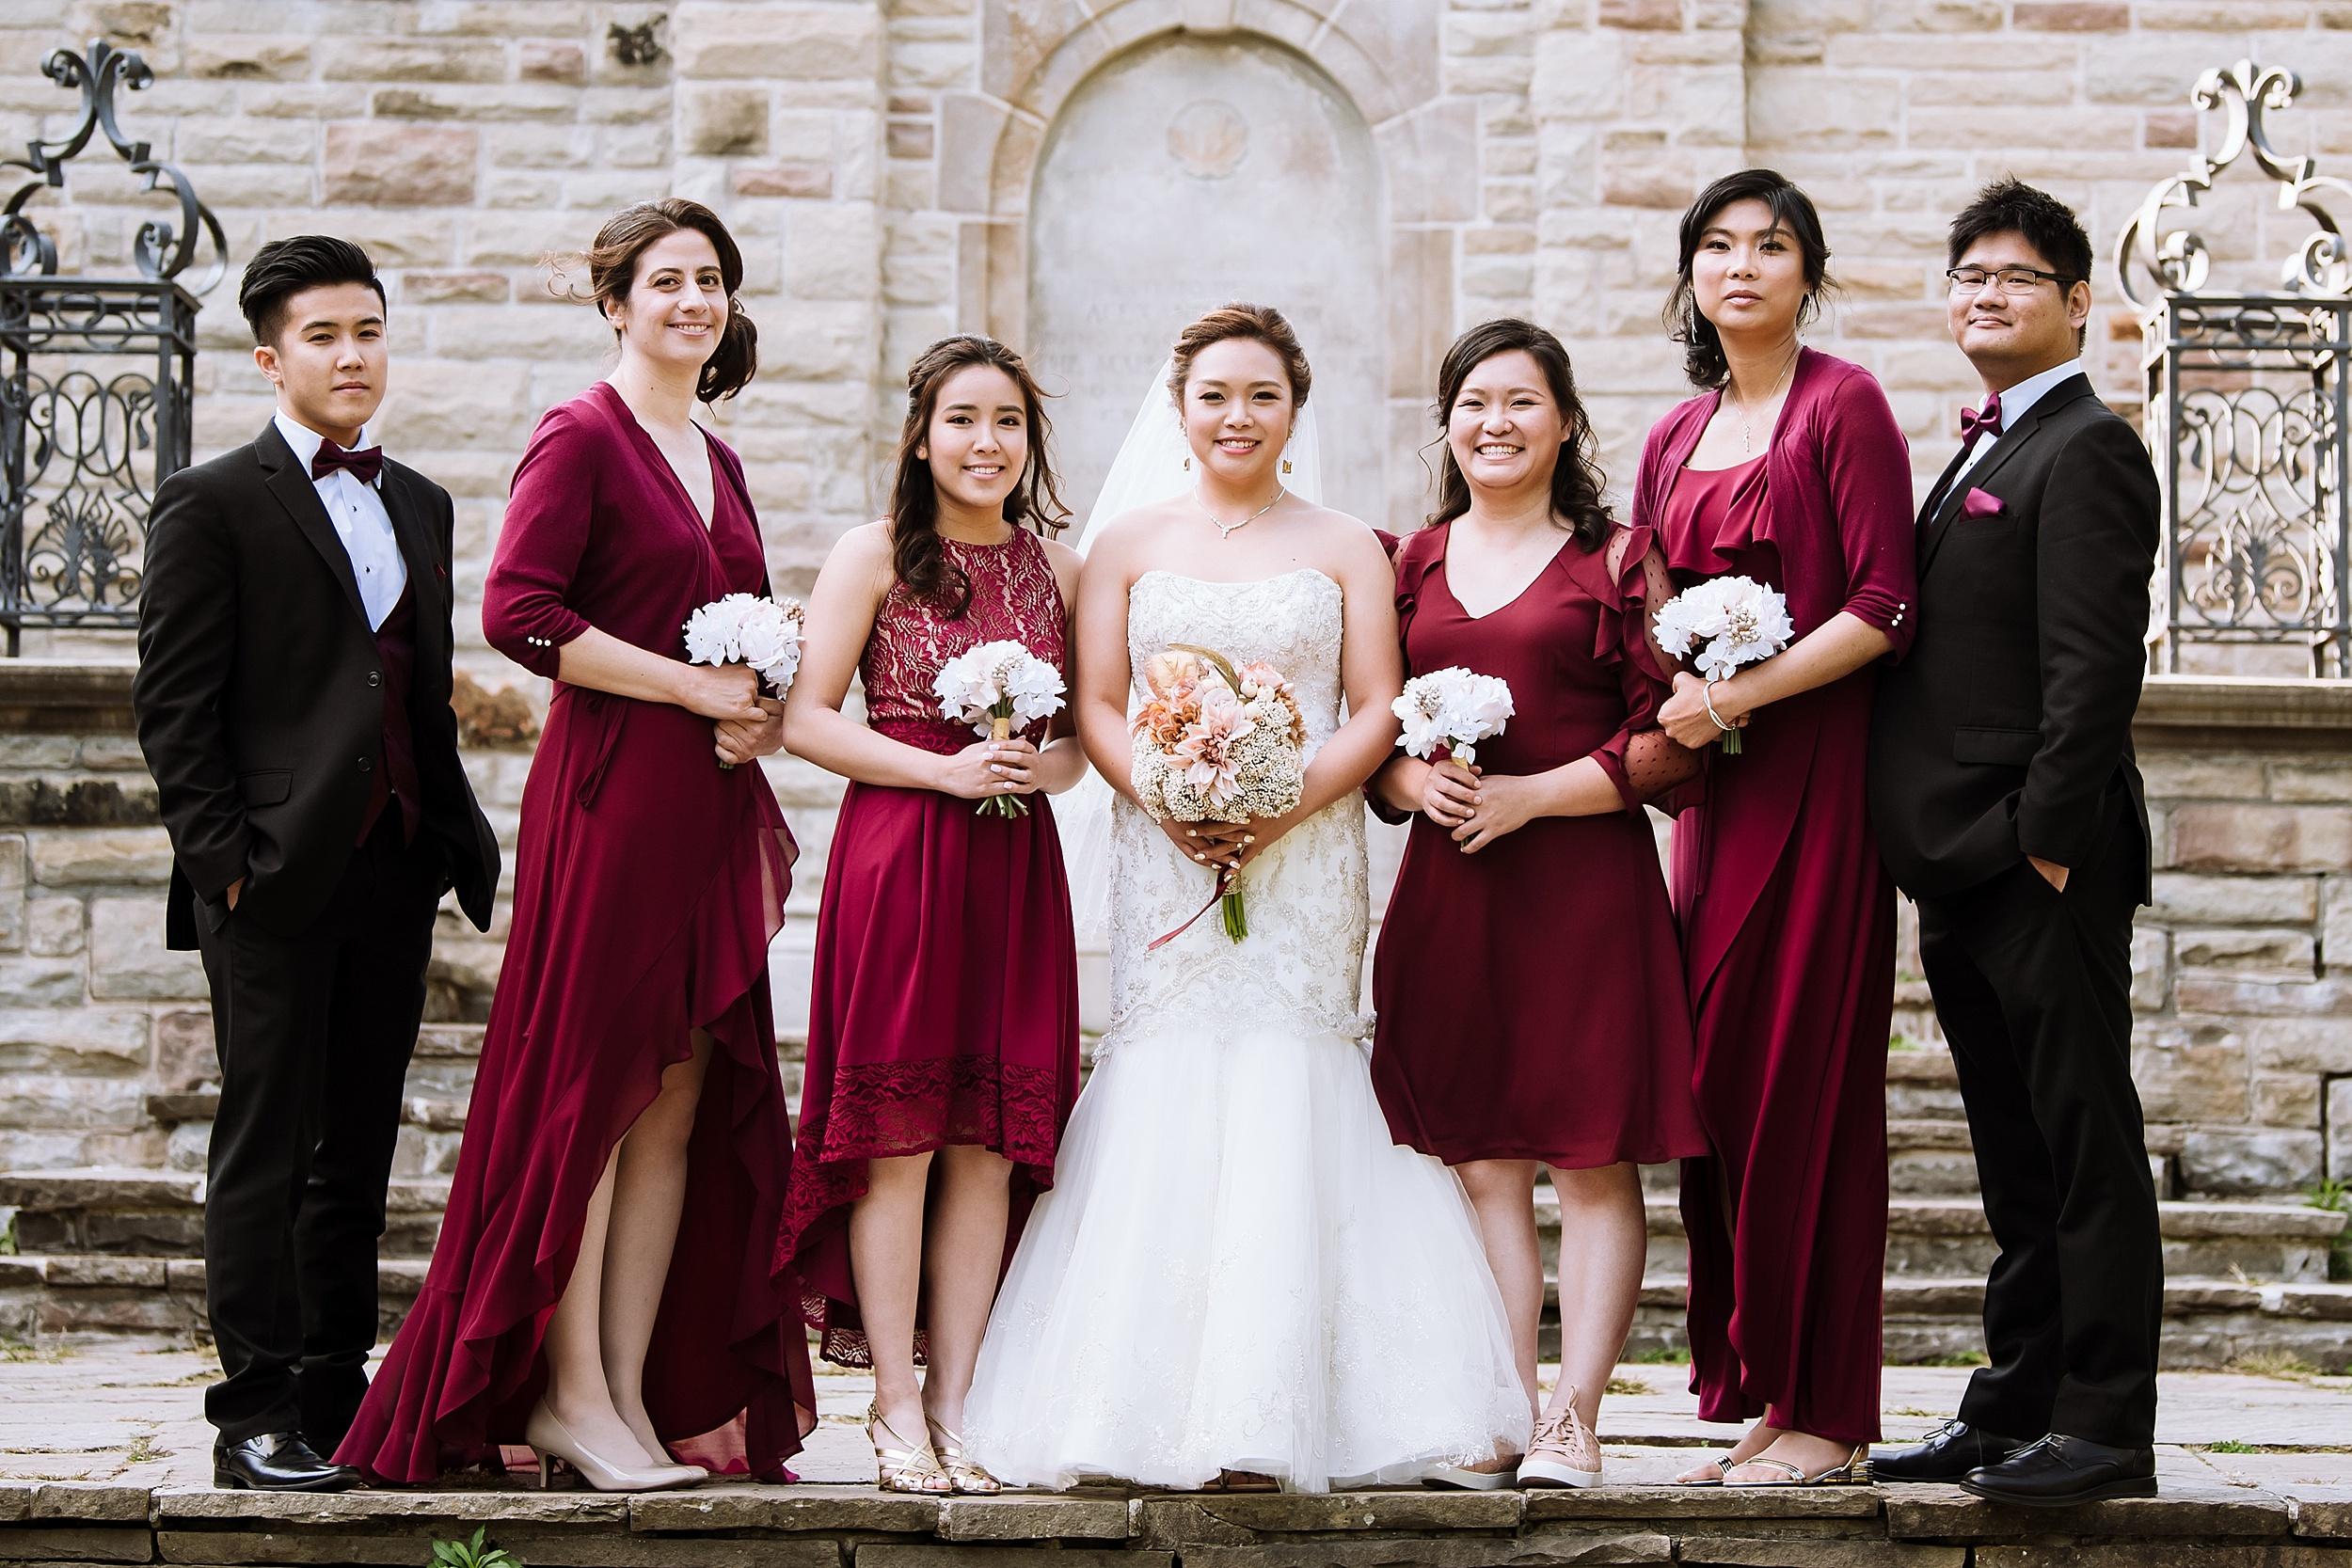 Sunnybrook_Estates_Alexander_Muir_Toronto_Wedding_Photographer_0032.jpg